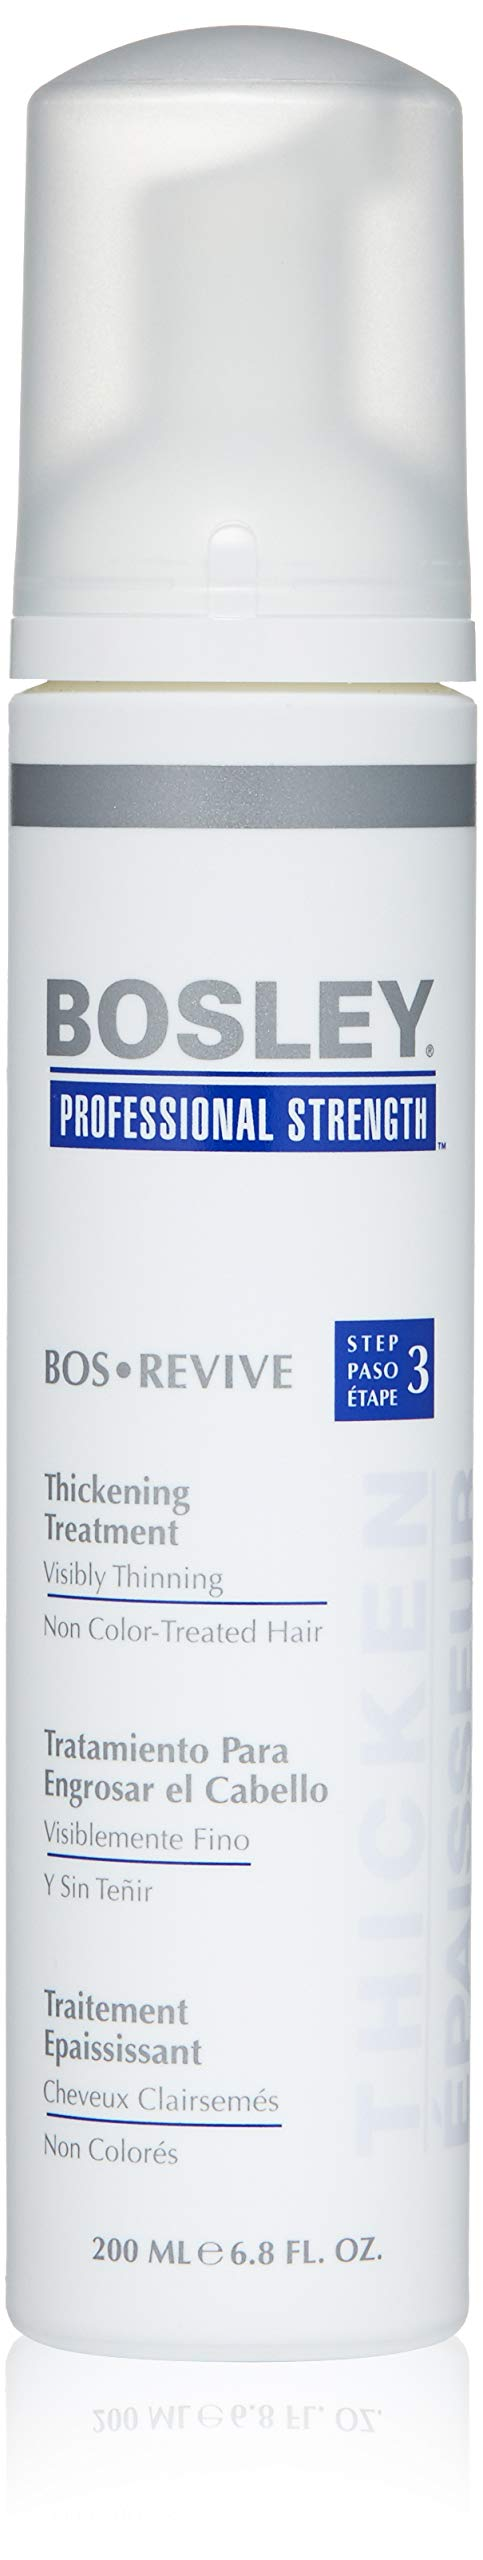 Bosley Professional Strength BOSRevive Treatment by Bosley Professional Strength